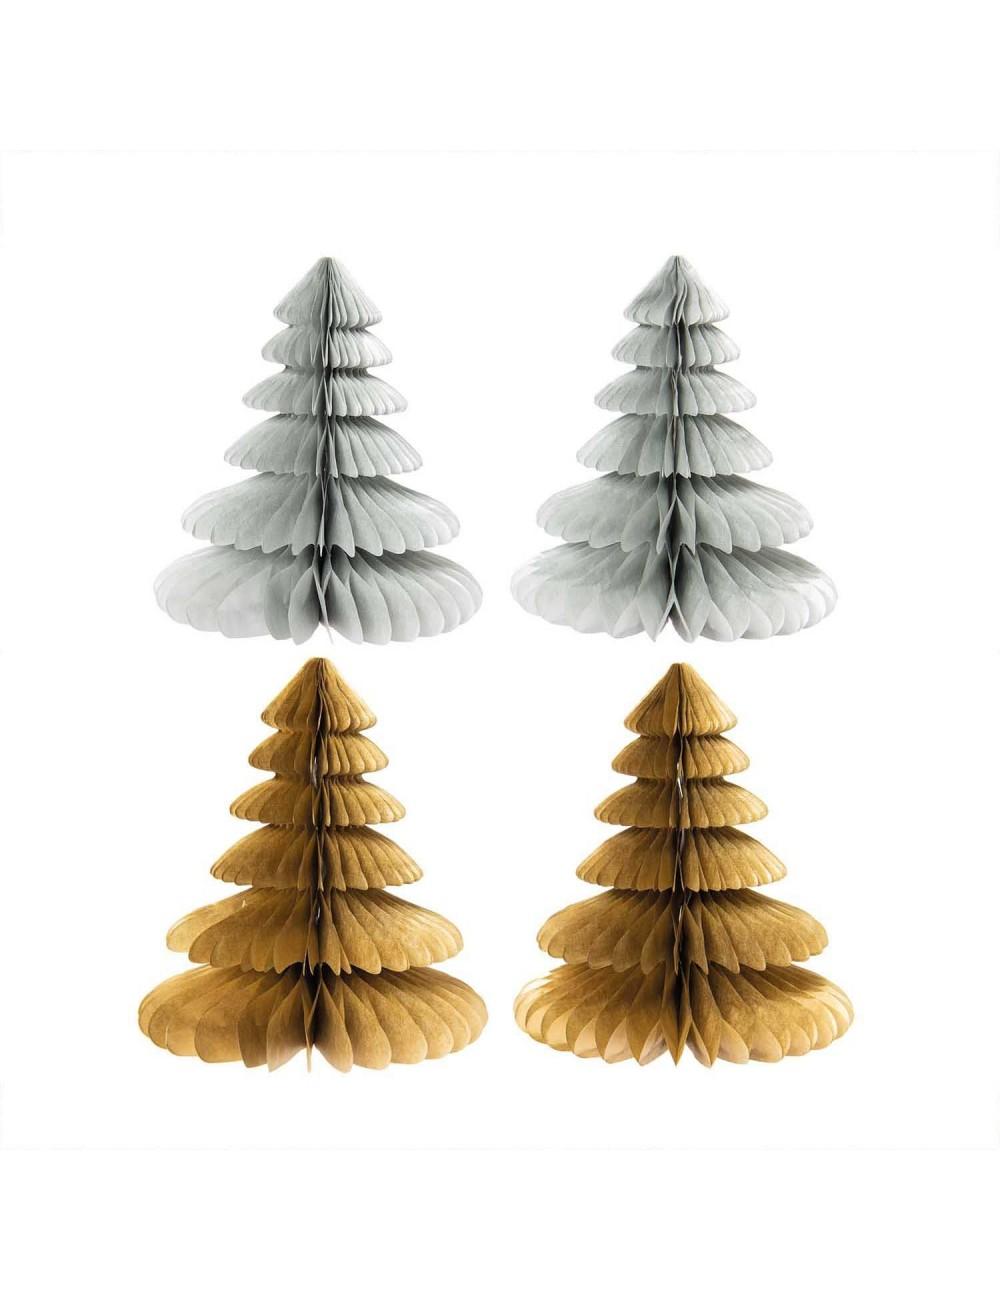 Tannenbäume 2-er Set Papier